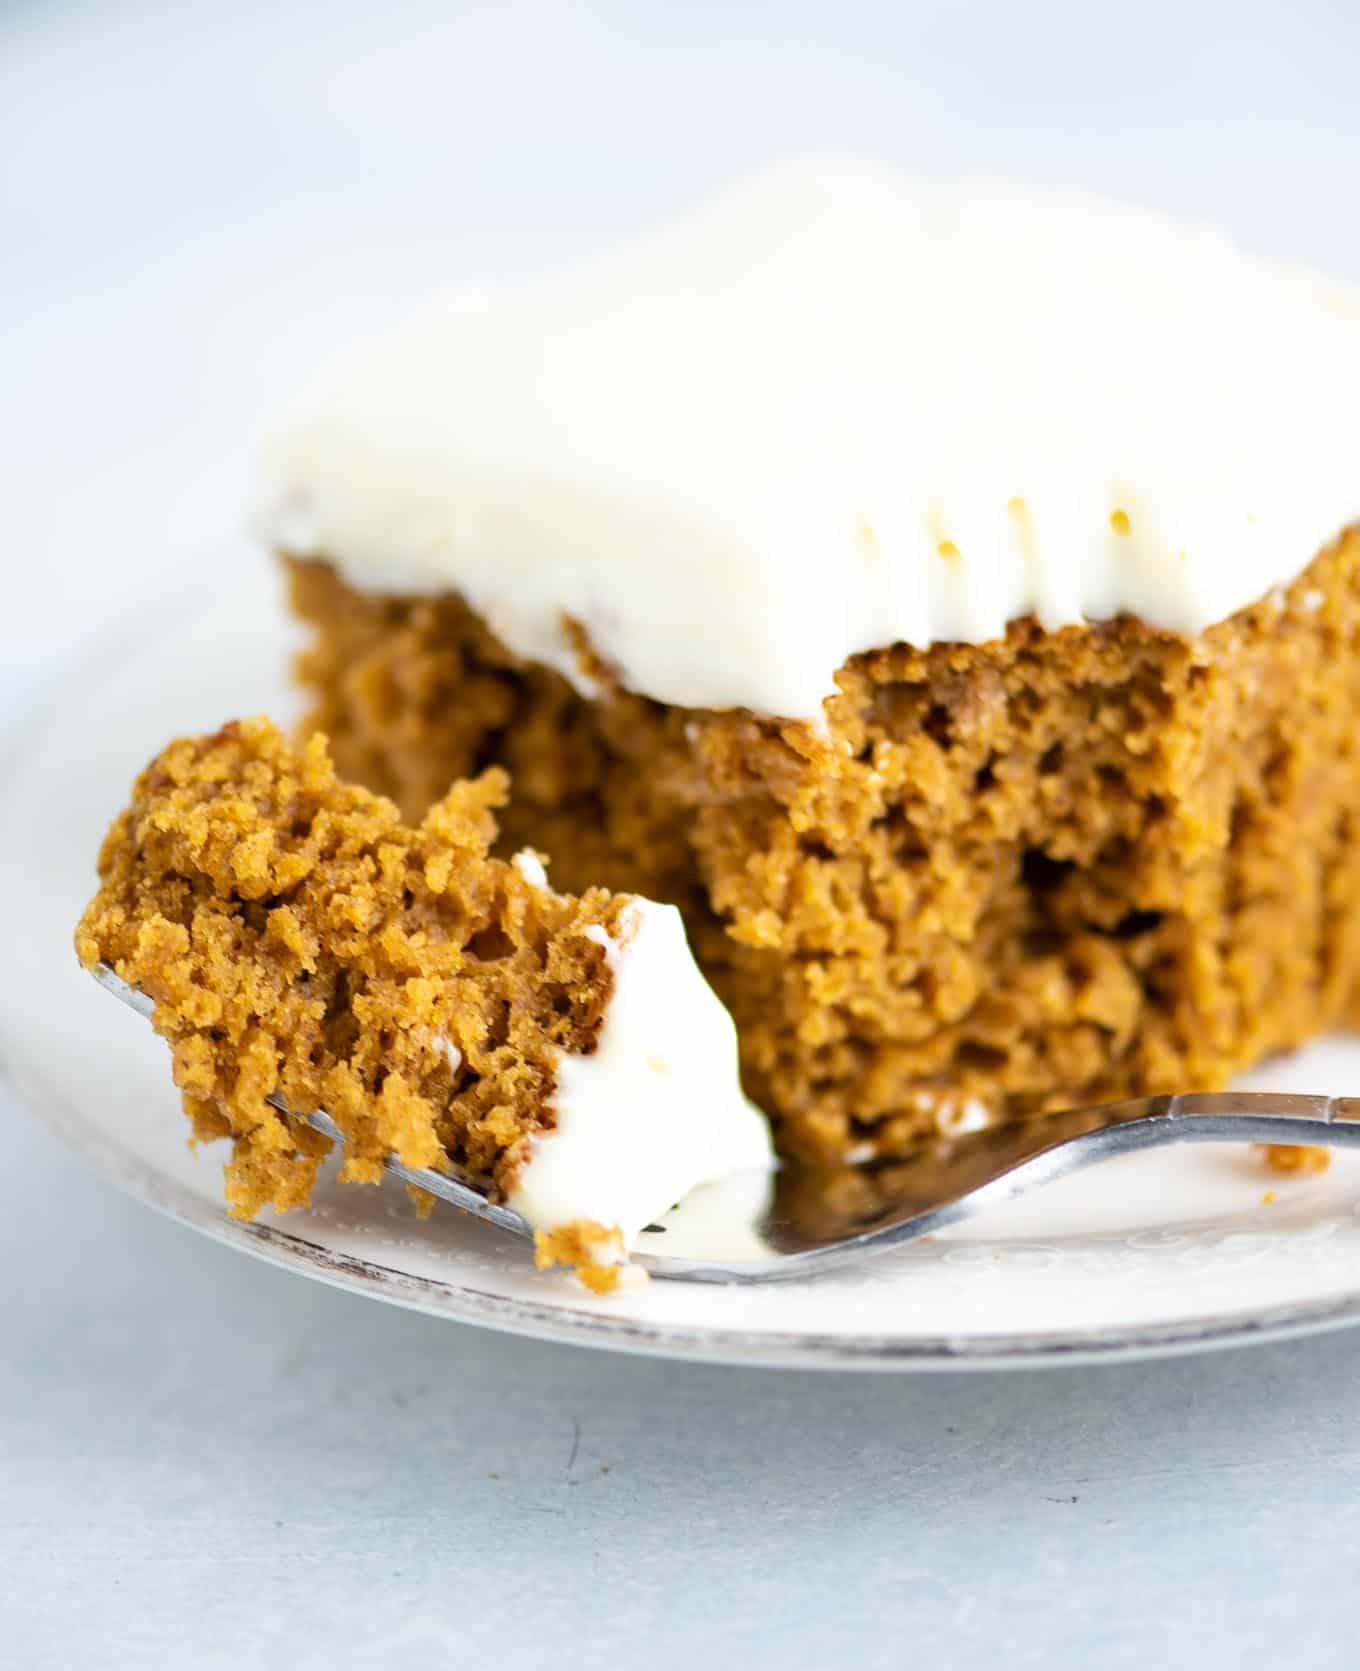 a bite of pumpkin cake